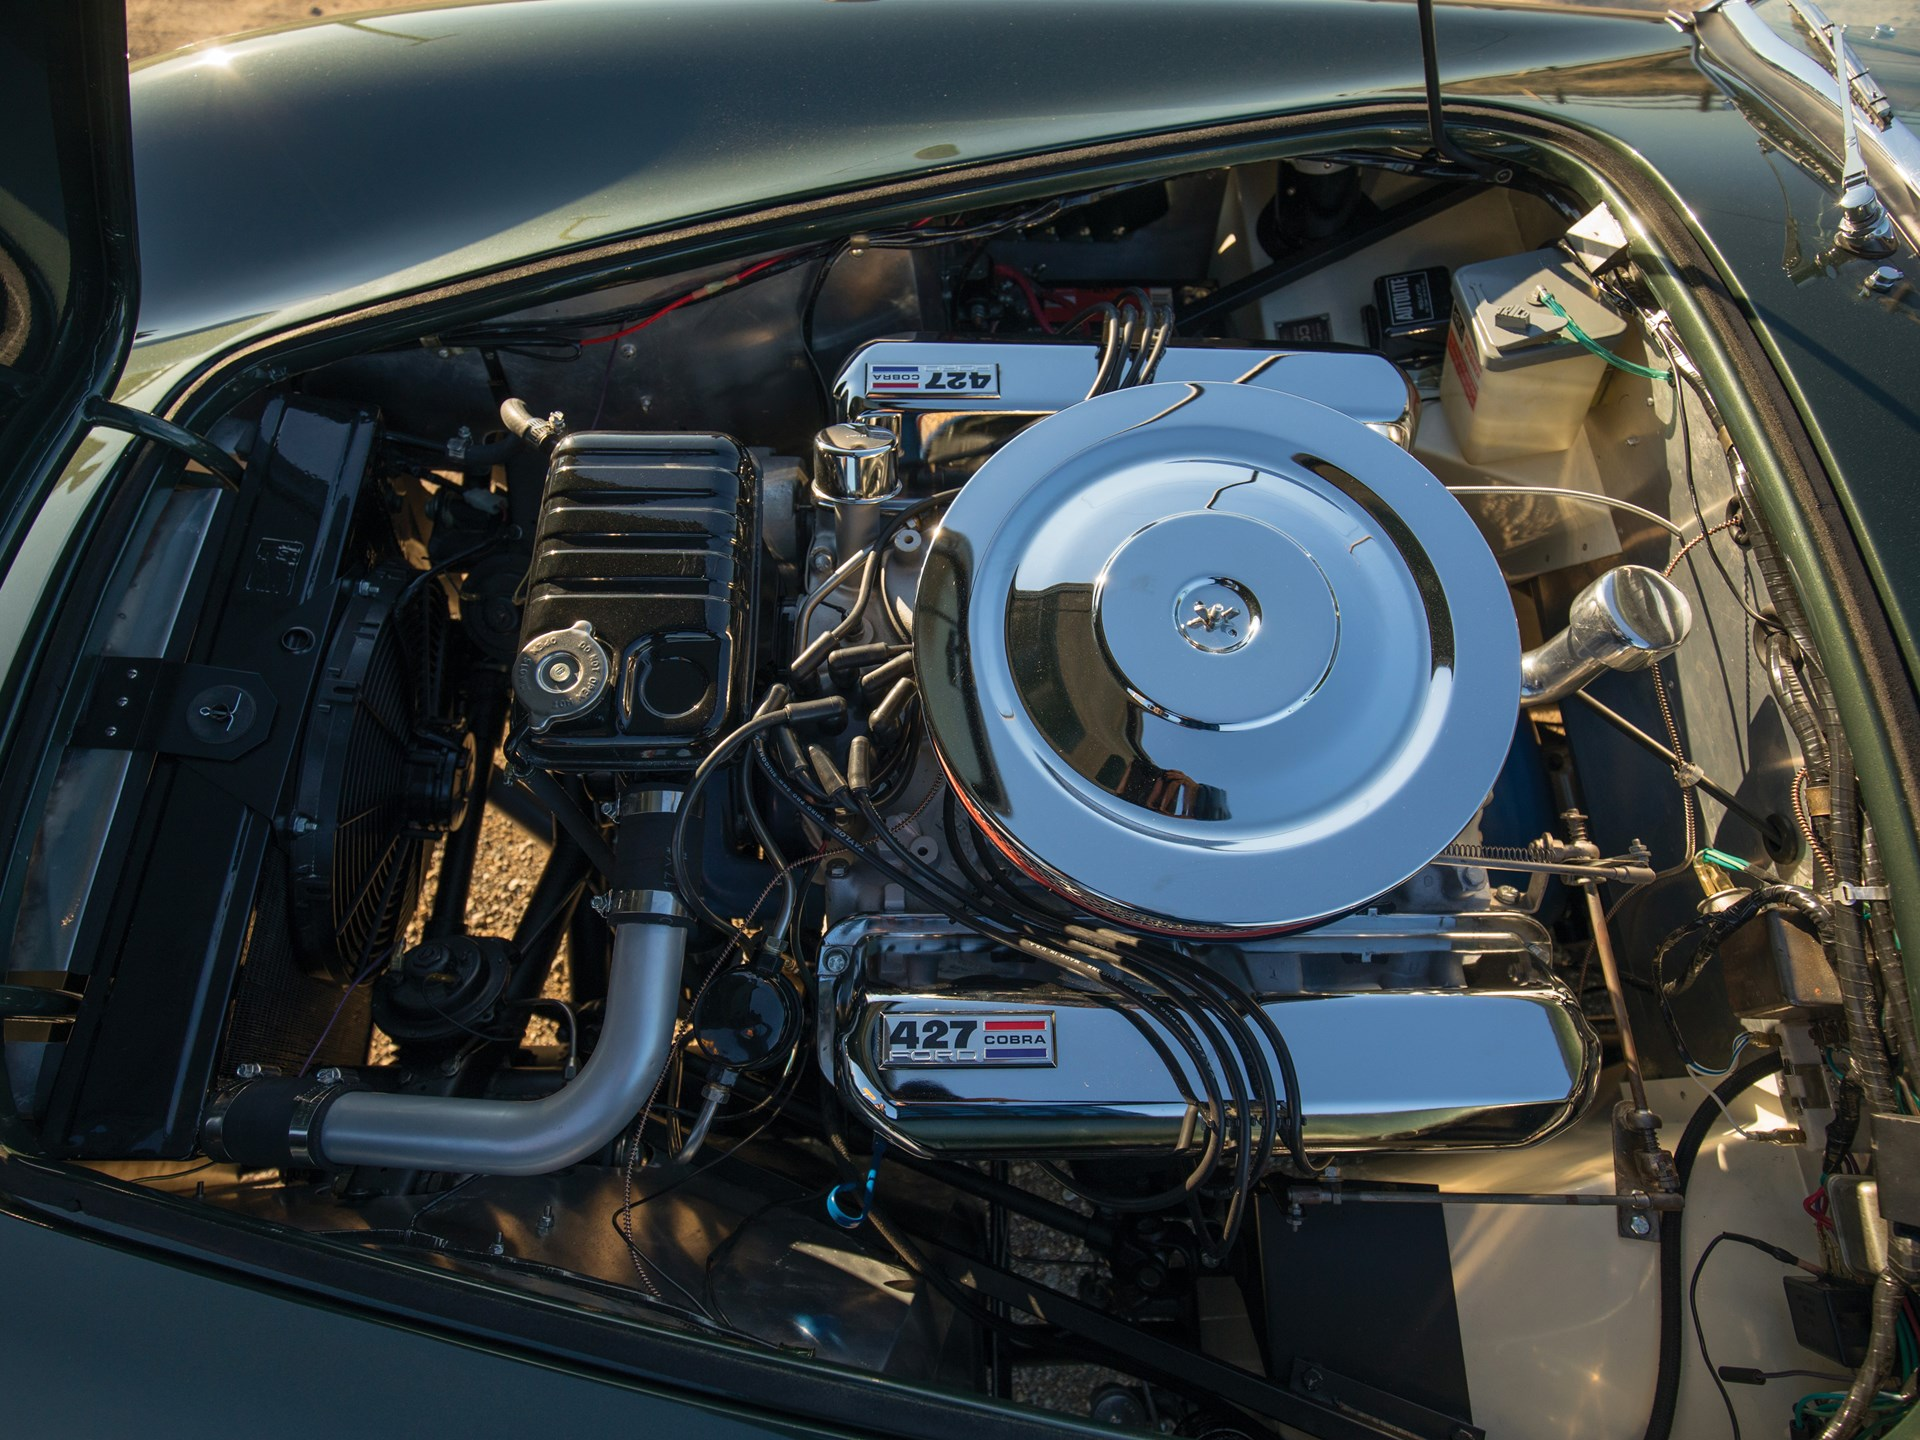 1967 Shelby 427 Cobra engine bay